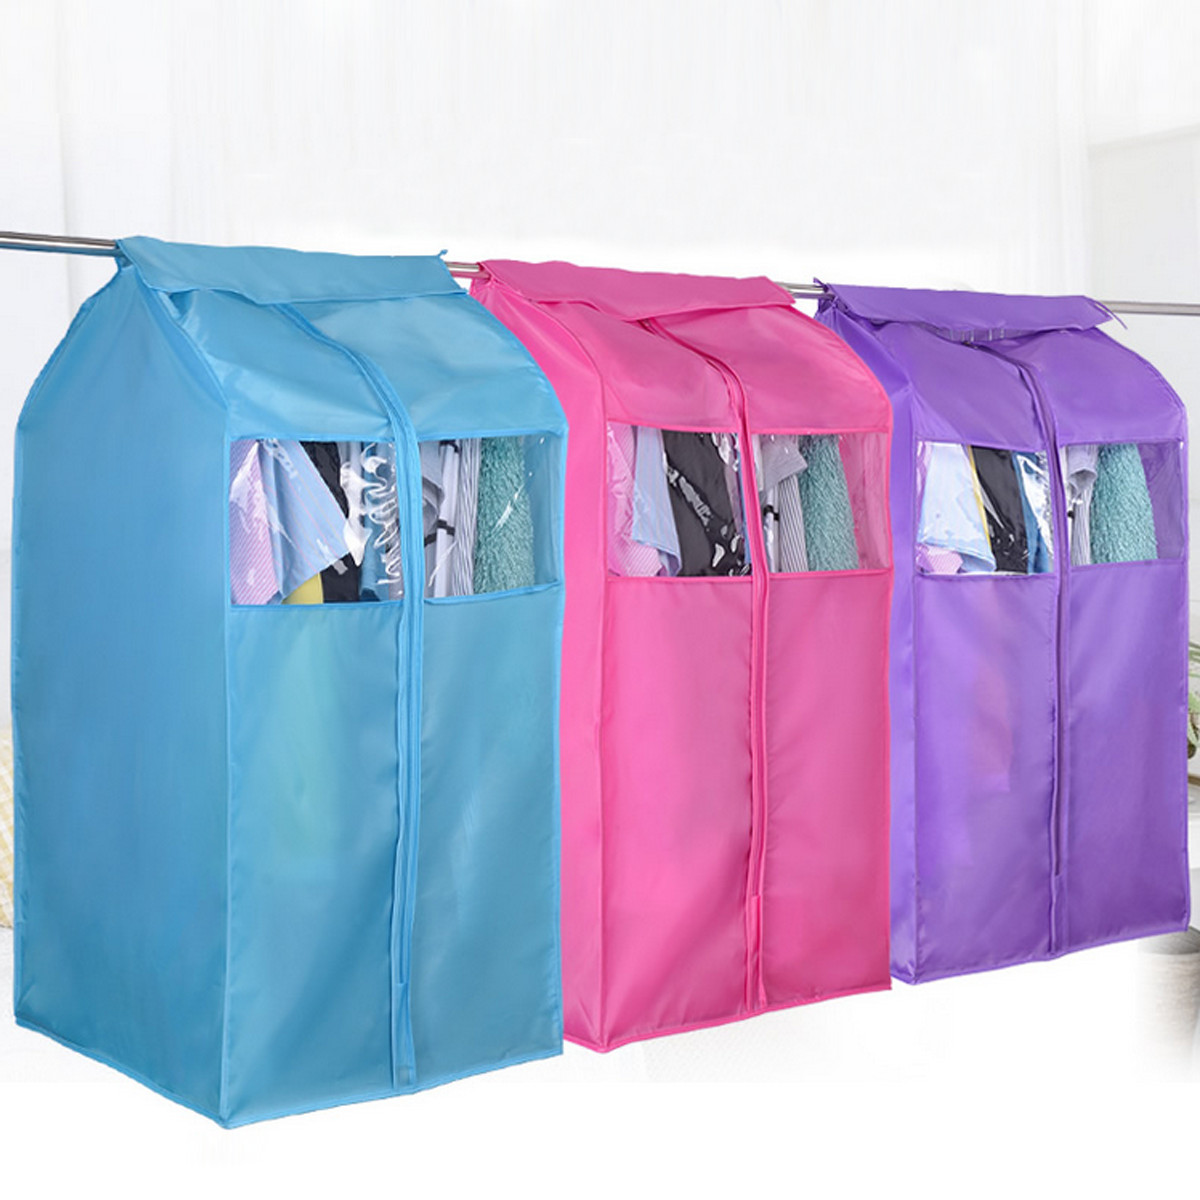 Oxford-Cloth-Hanging-Storage-Bag-Garment-Suit-Coat- & Oxford Cloth Hanging Storage Bag Garment Suit Coat Wardrobe Dust ...